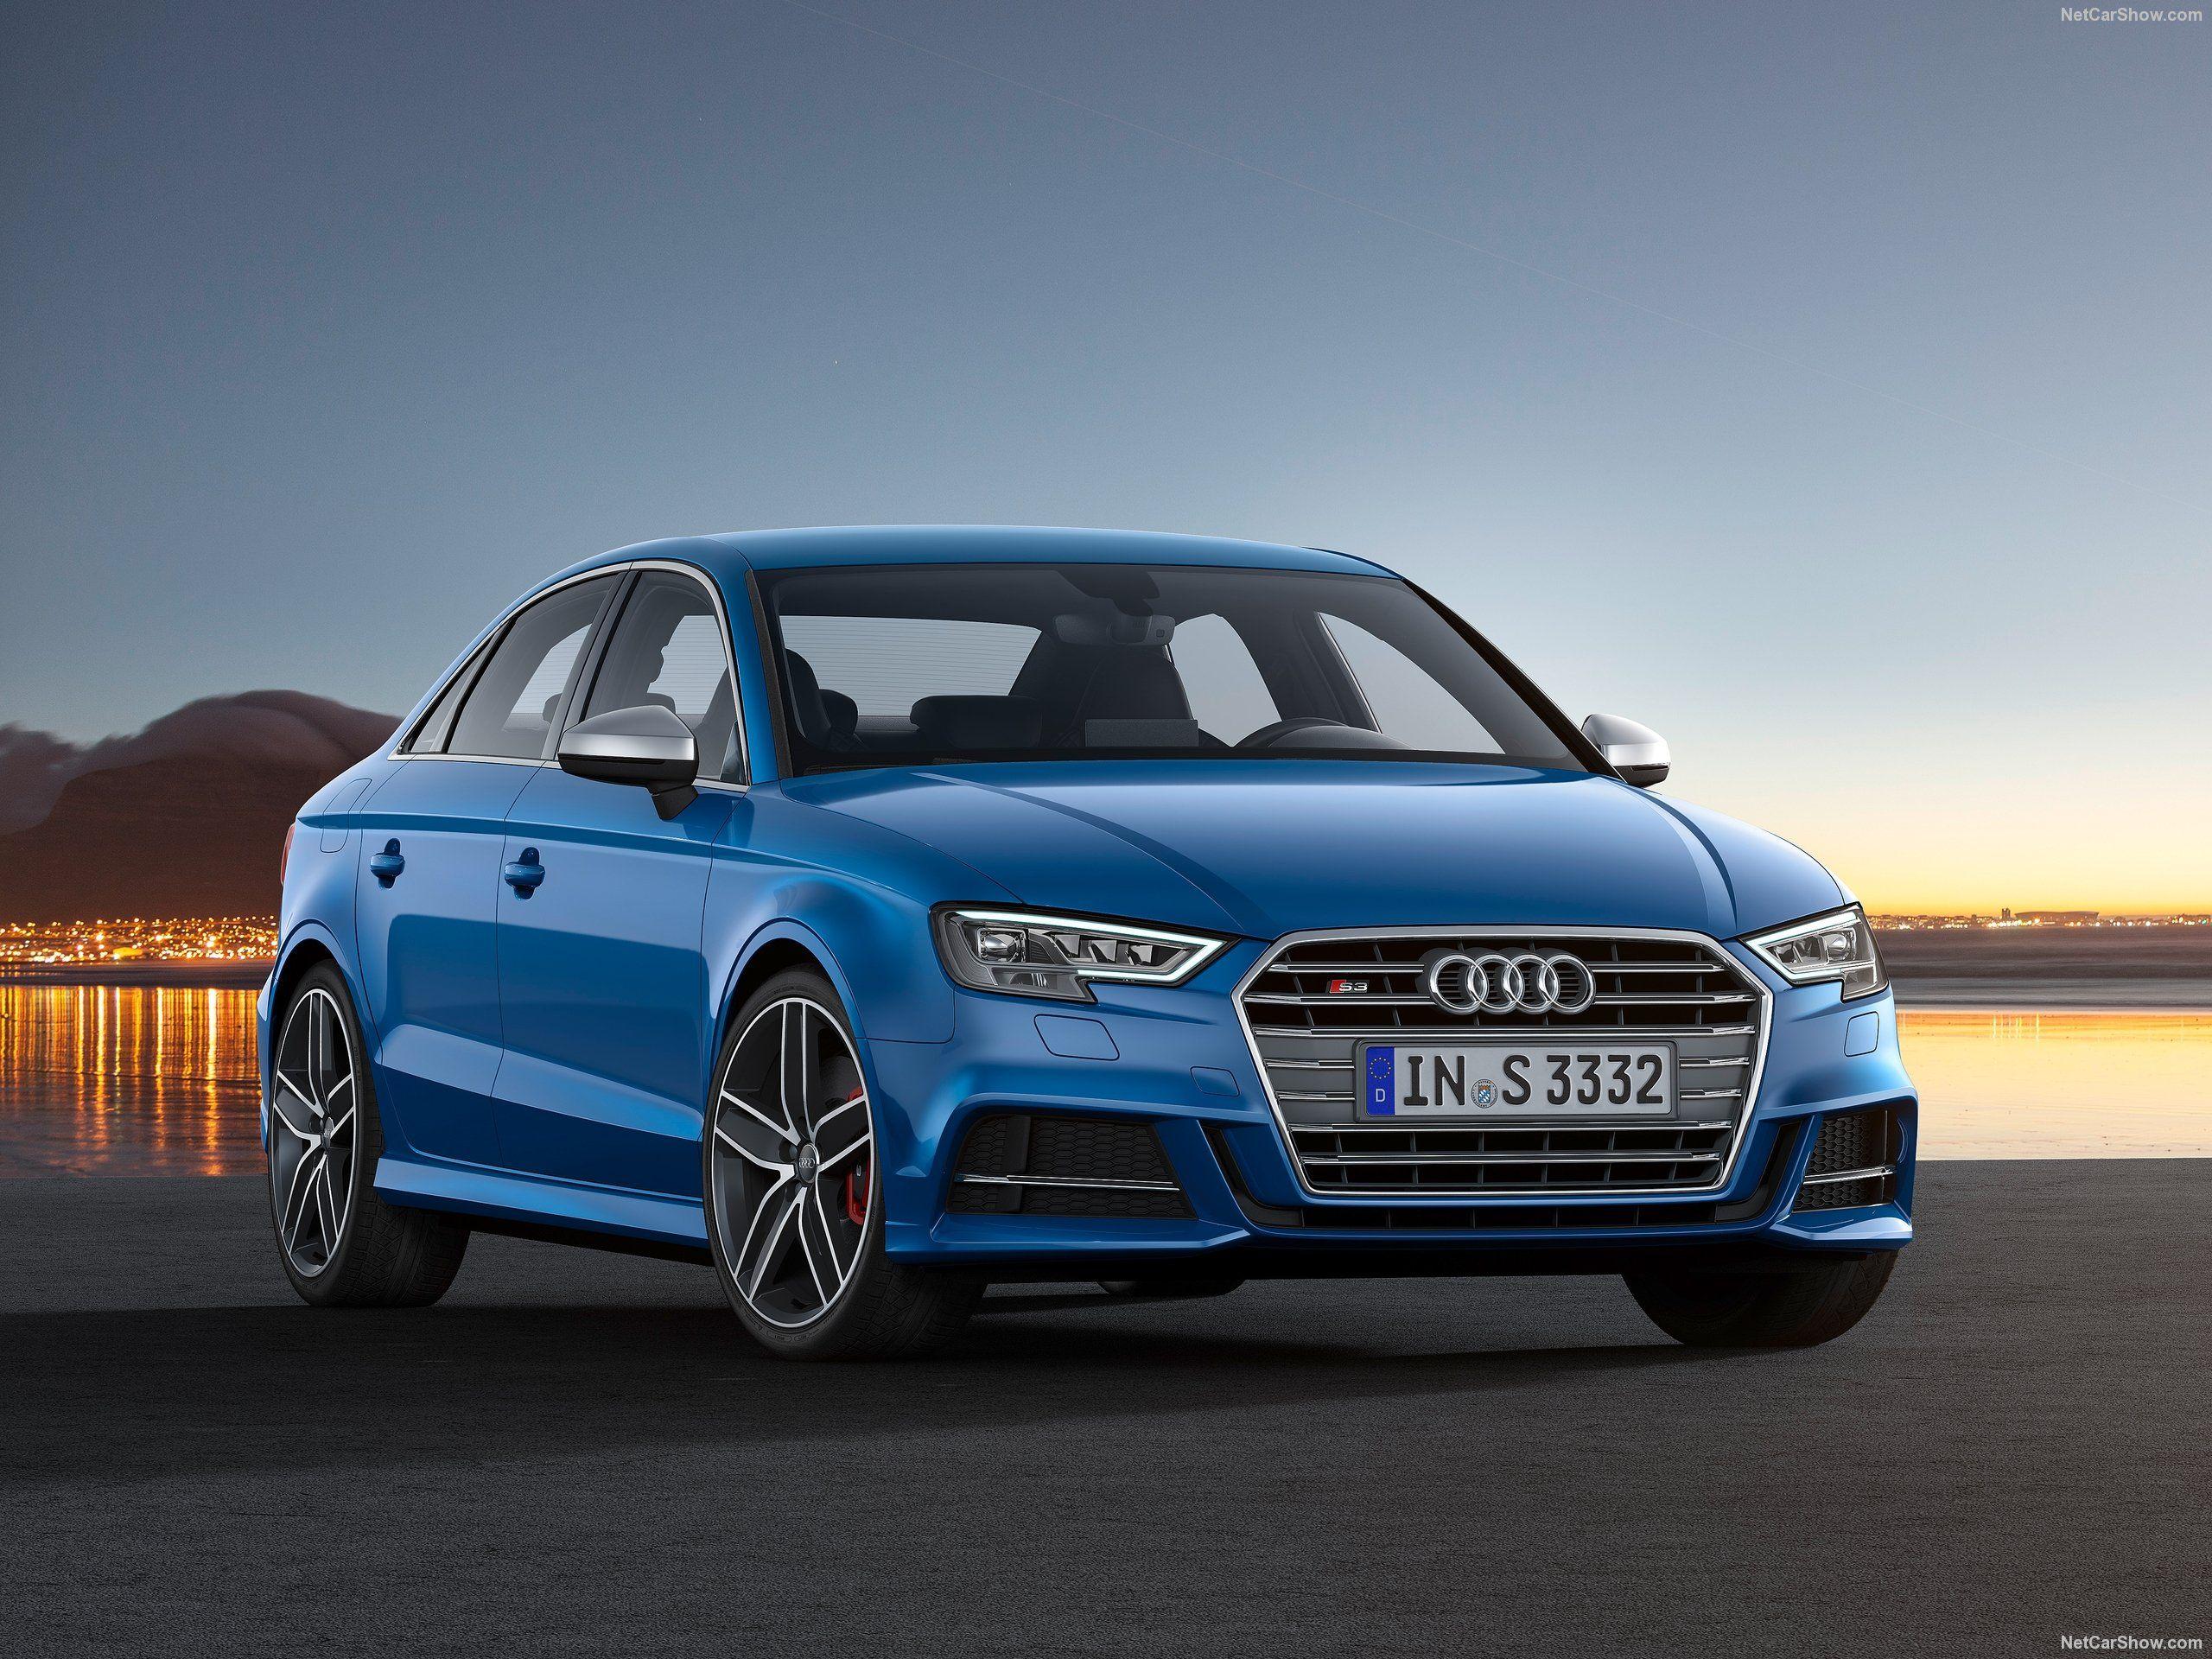 2017 Audi S3 Review Carsmid Sedan Cars Audi Motor Audi